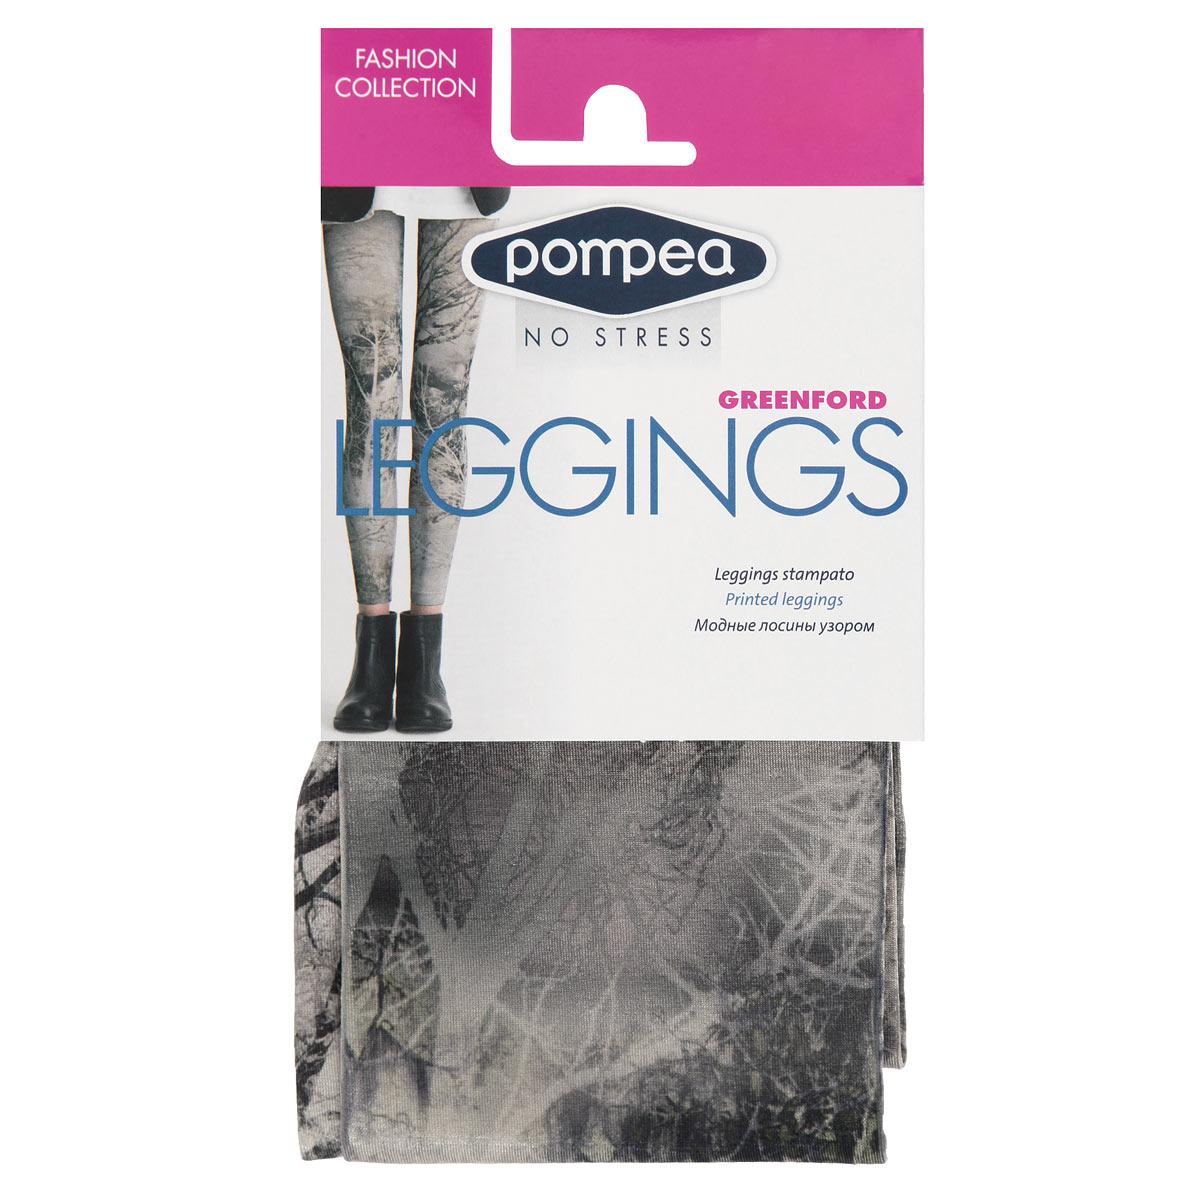 Леггинсы женские Pompea Leggings Greenford Fashion, цвет: Nature (природа). Размер 3-4 (3/4-M/L)